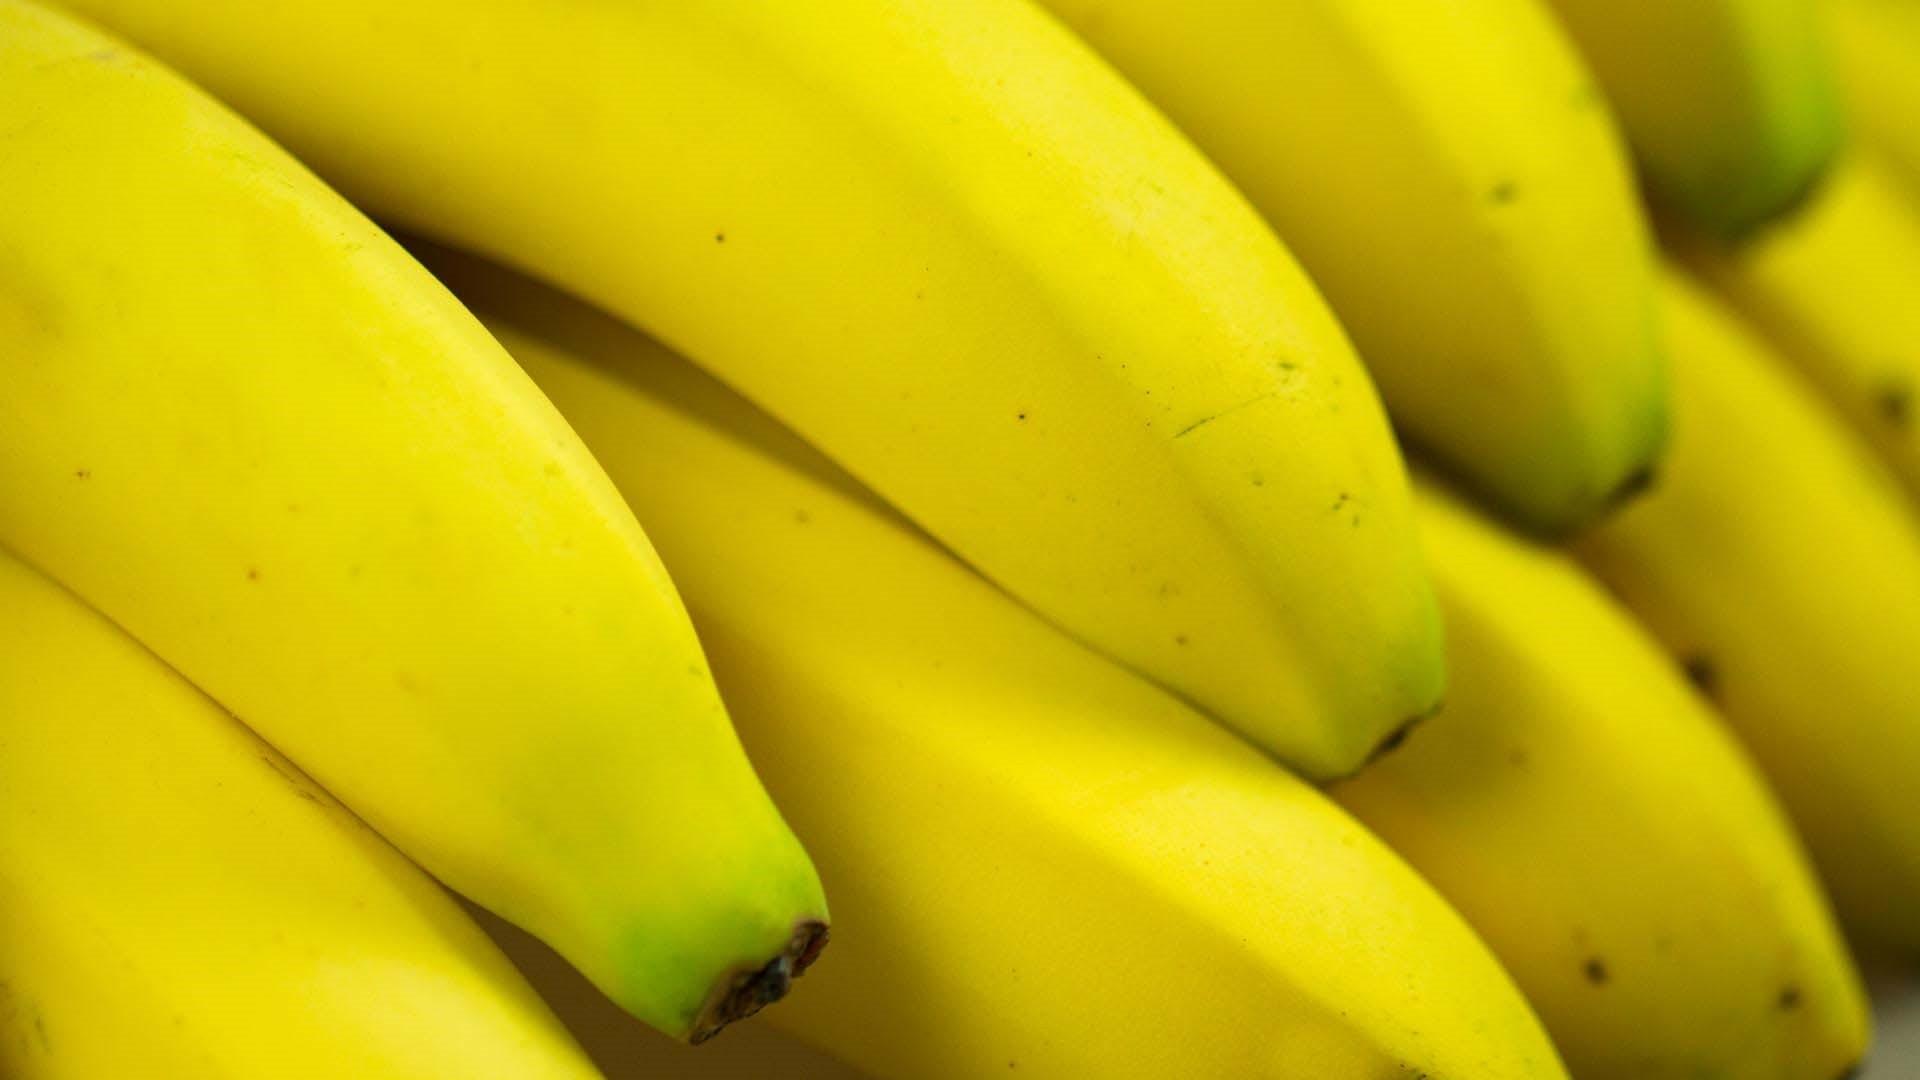 Banana Desktop Wallpaper